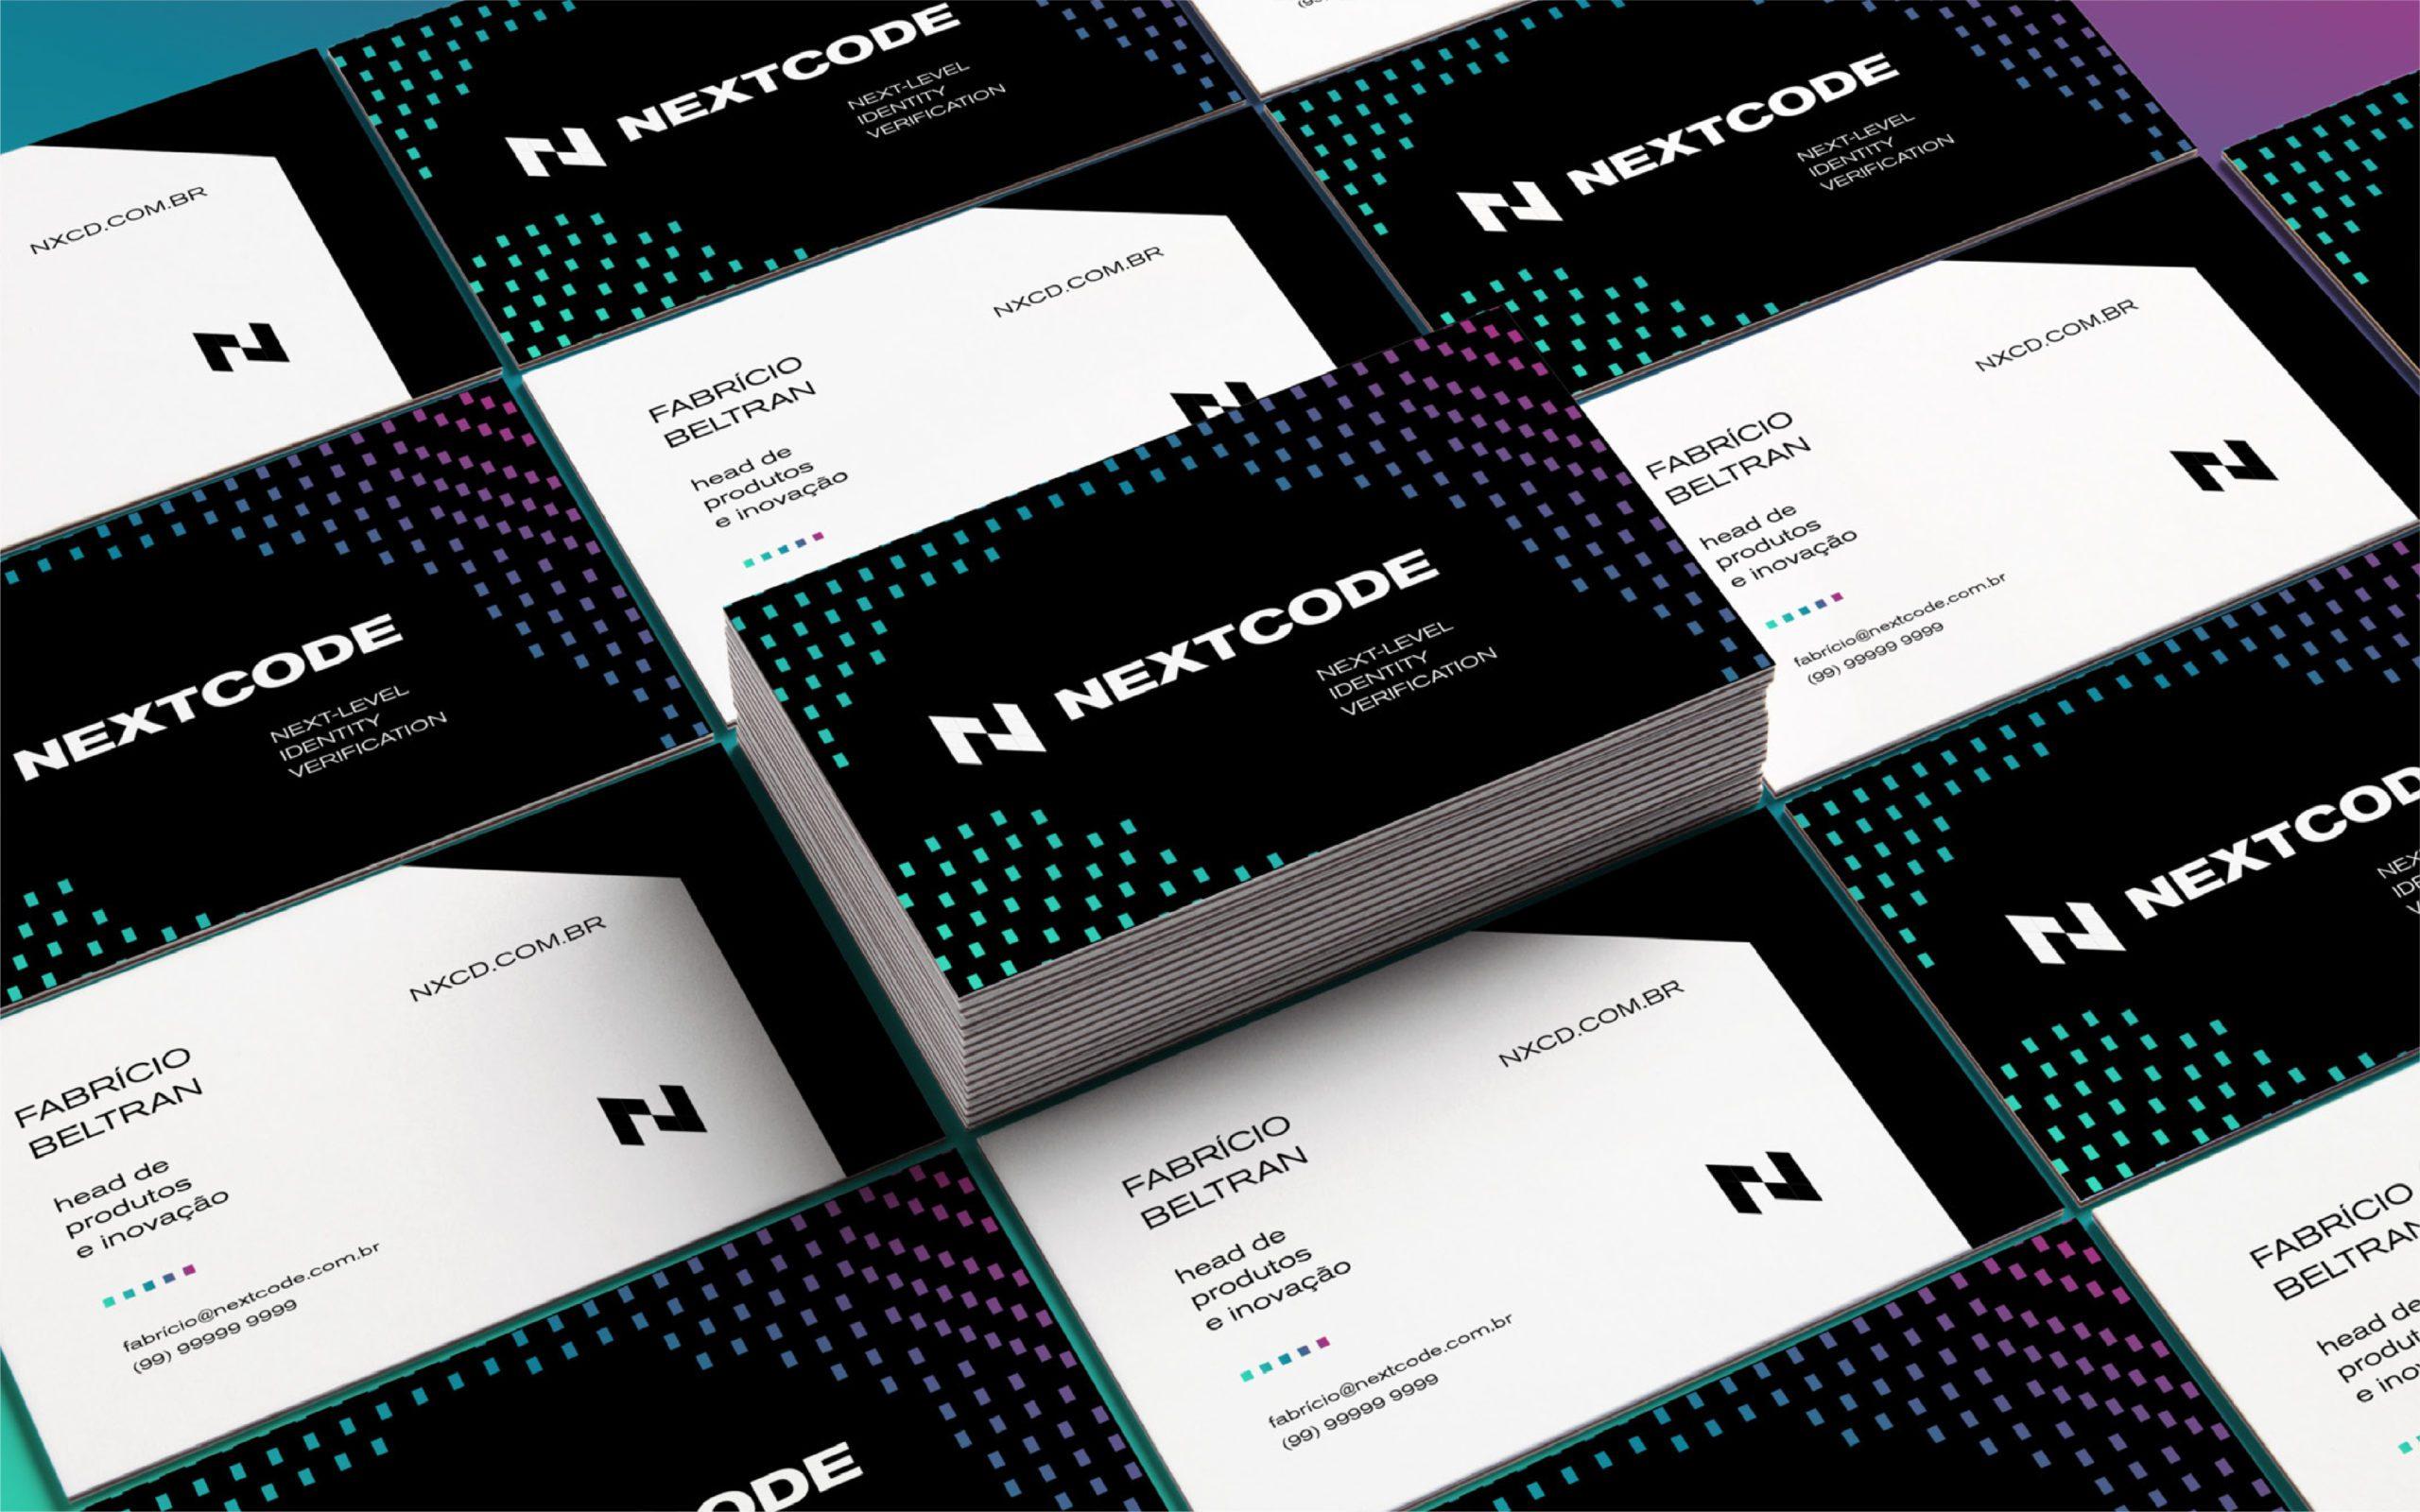 nextcode-branding-design-startup-79